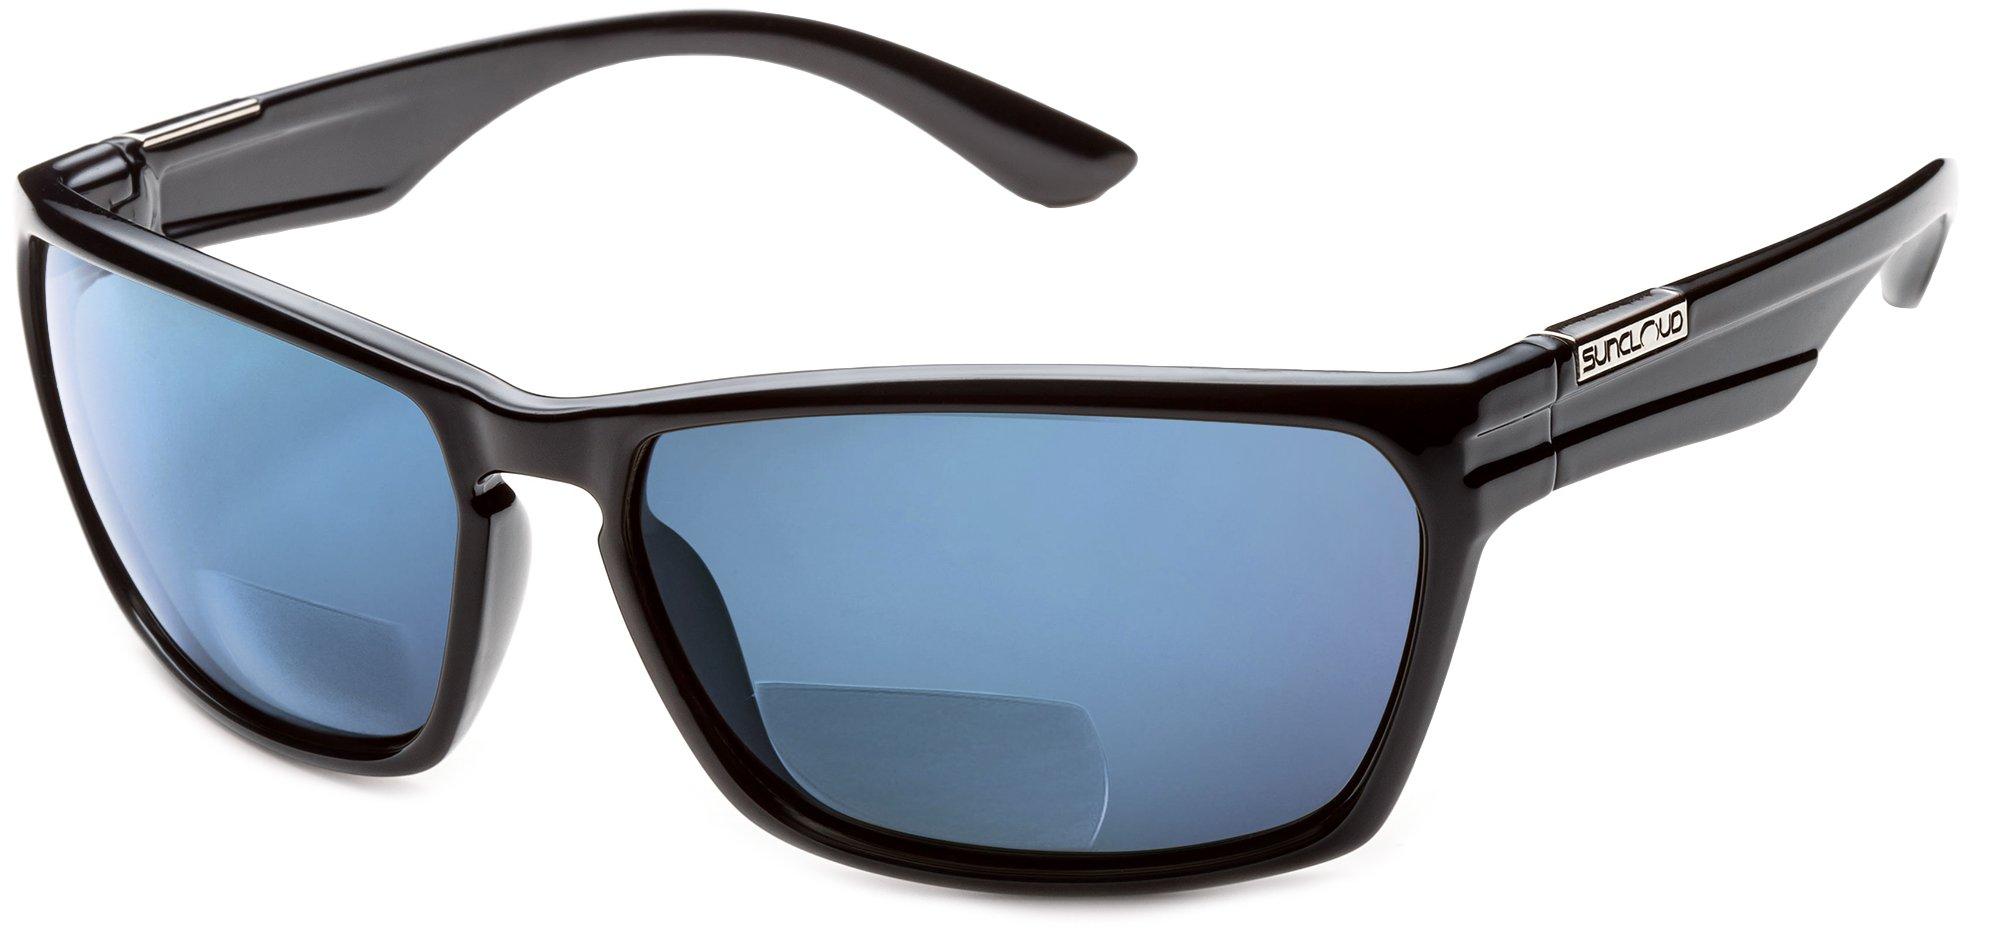 Suncloud Cutout Polarized Bi-Focal Reading Sunglasses in Black w/ Blue Mirror Lens +2.25